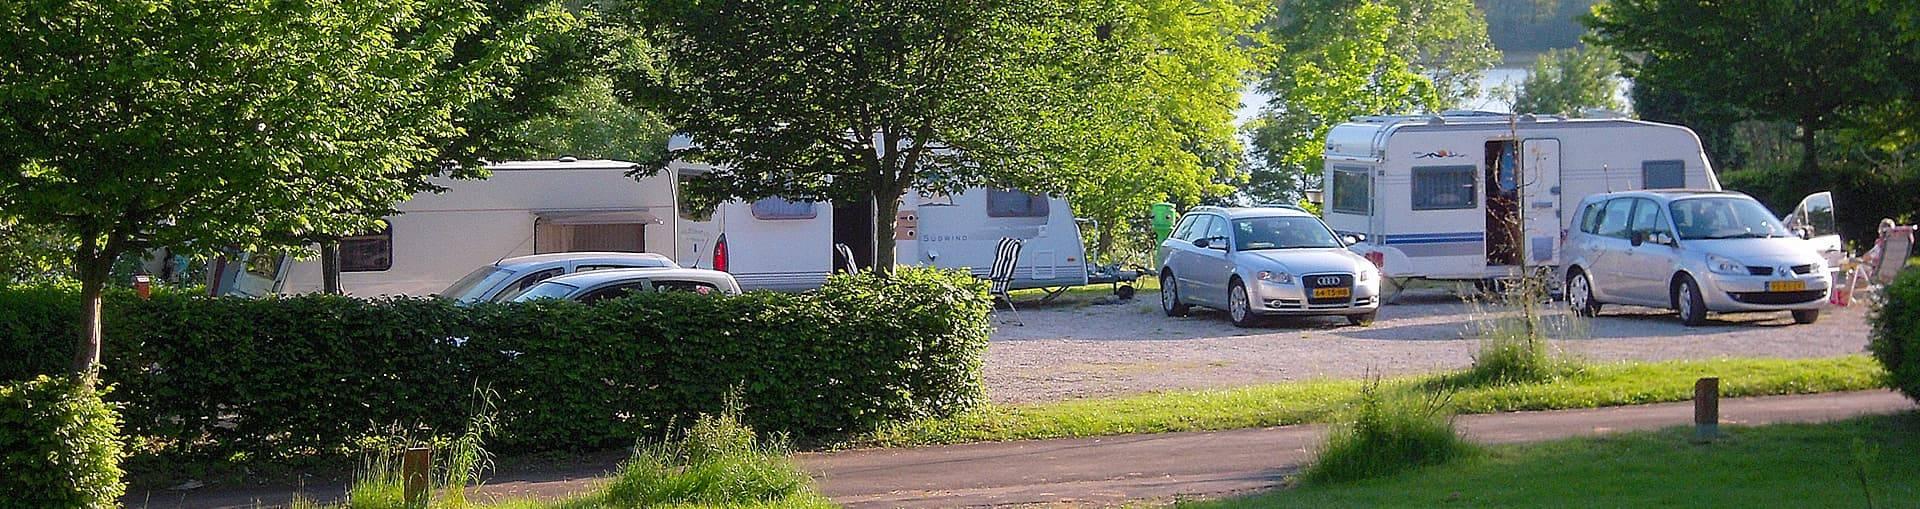 OTAA_Header_Camping_1920x509.jpg